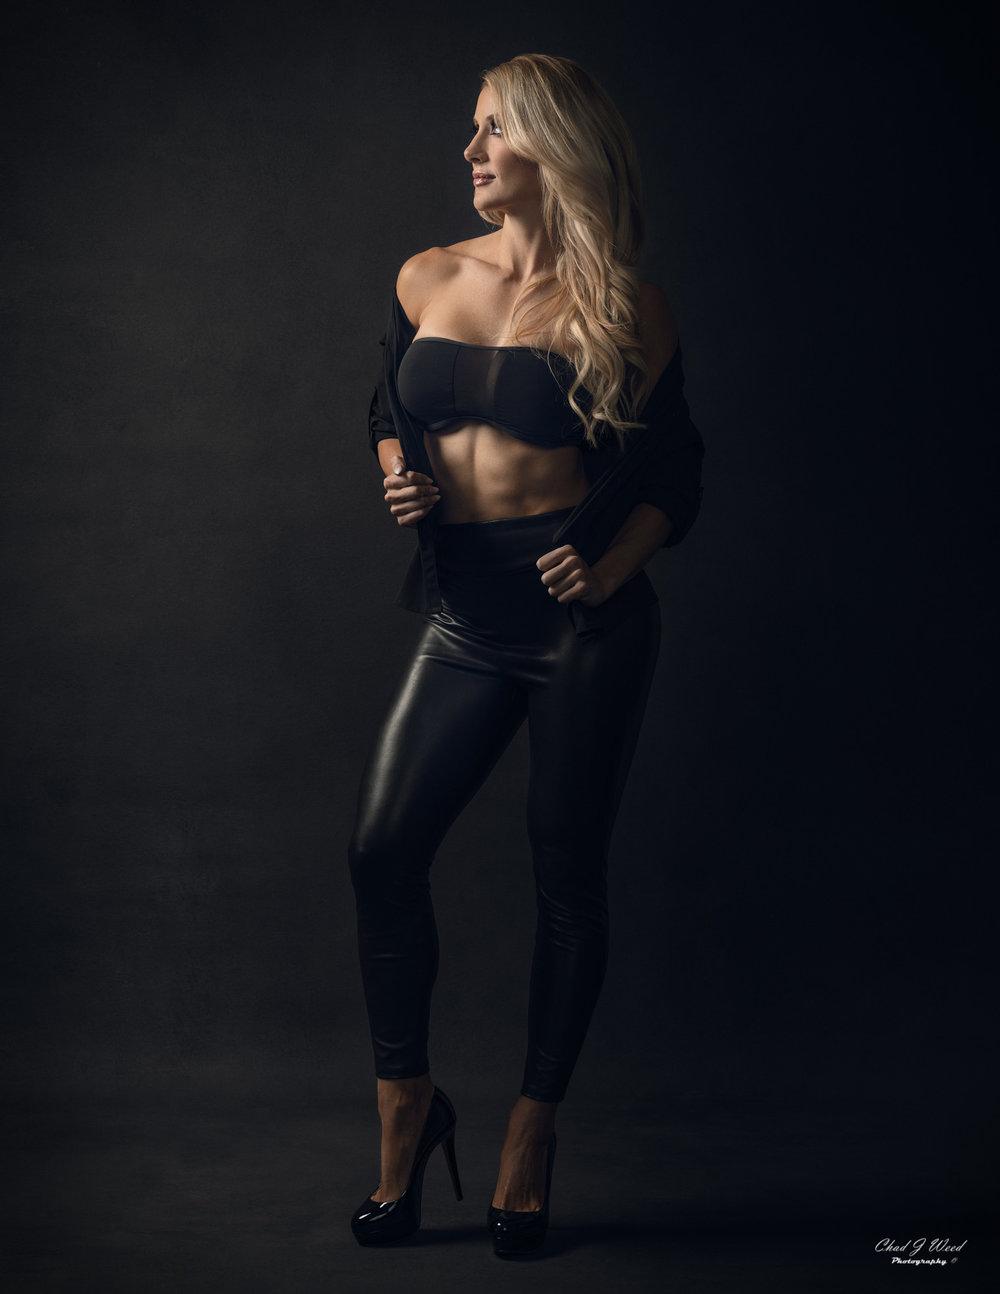 Mesa Arizona Fashion Photographer Chad Weed with Fashion Model Kristi - 2